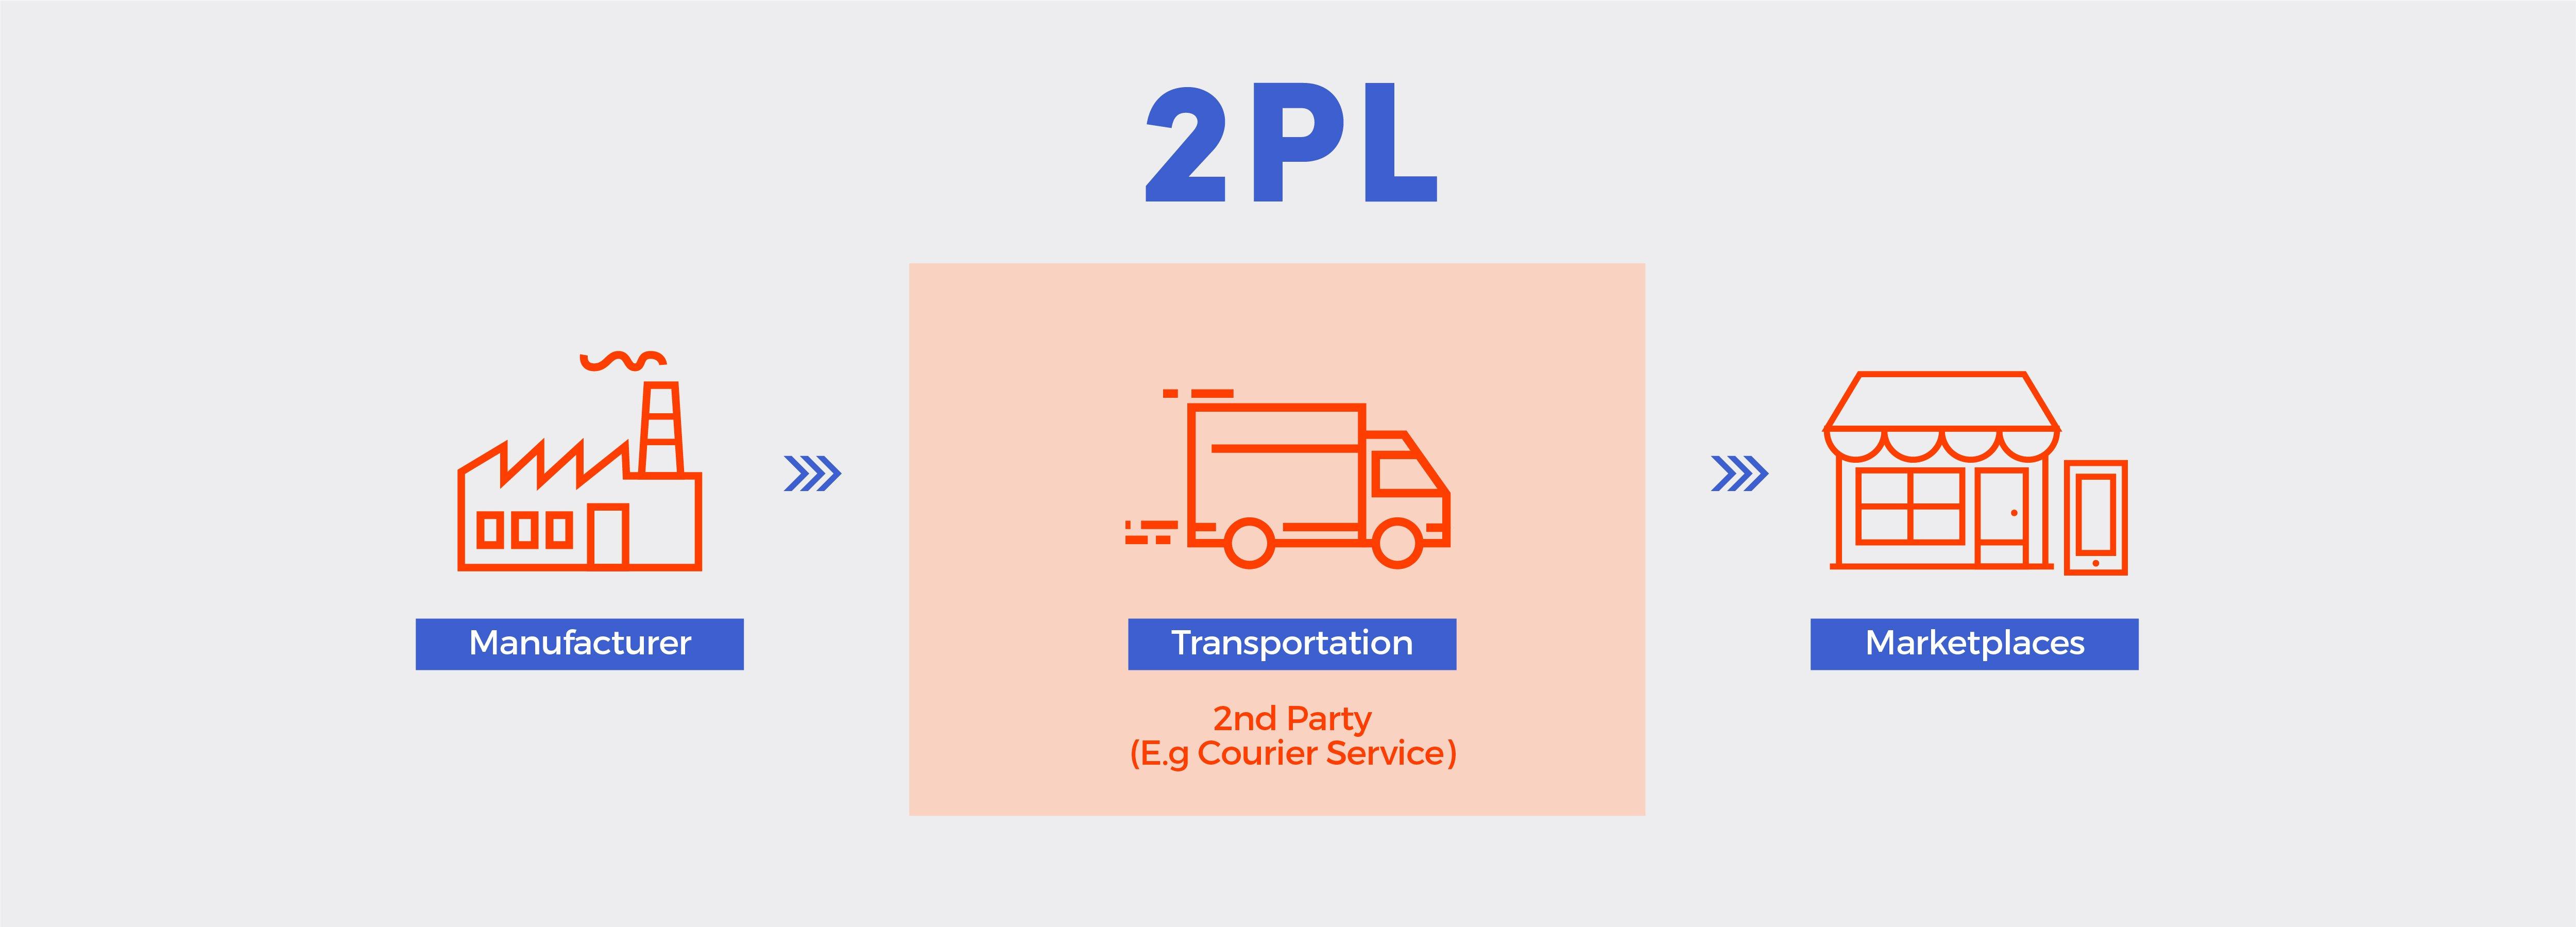 A 2PL Supply Chain Flowchart